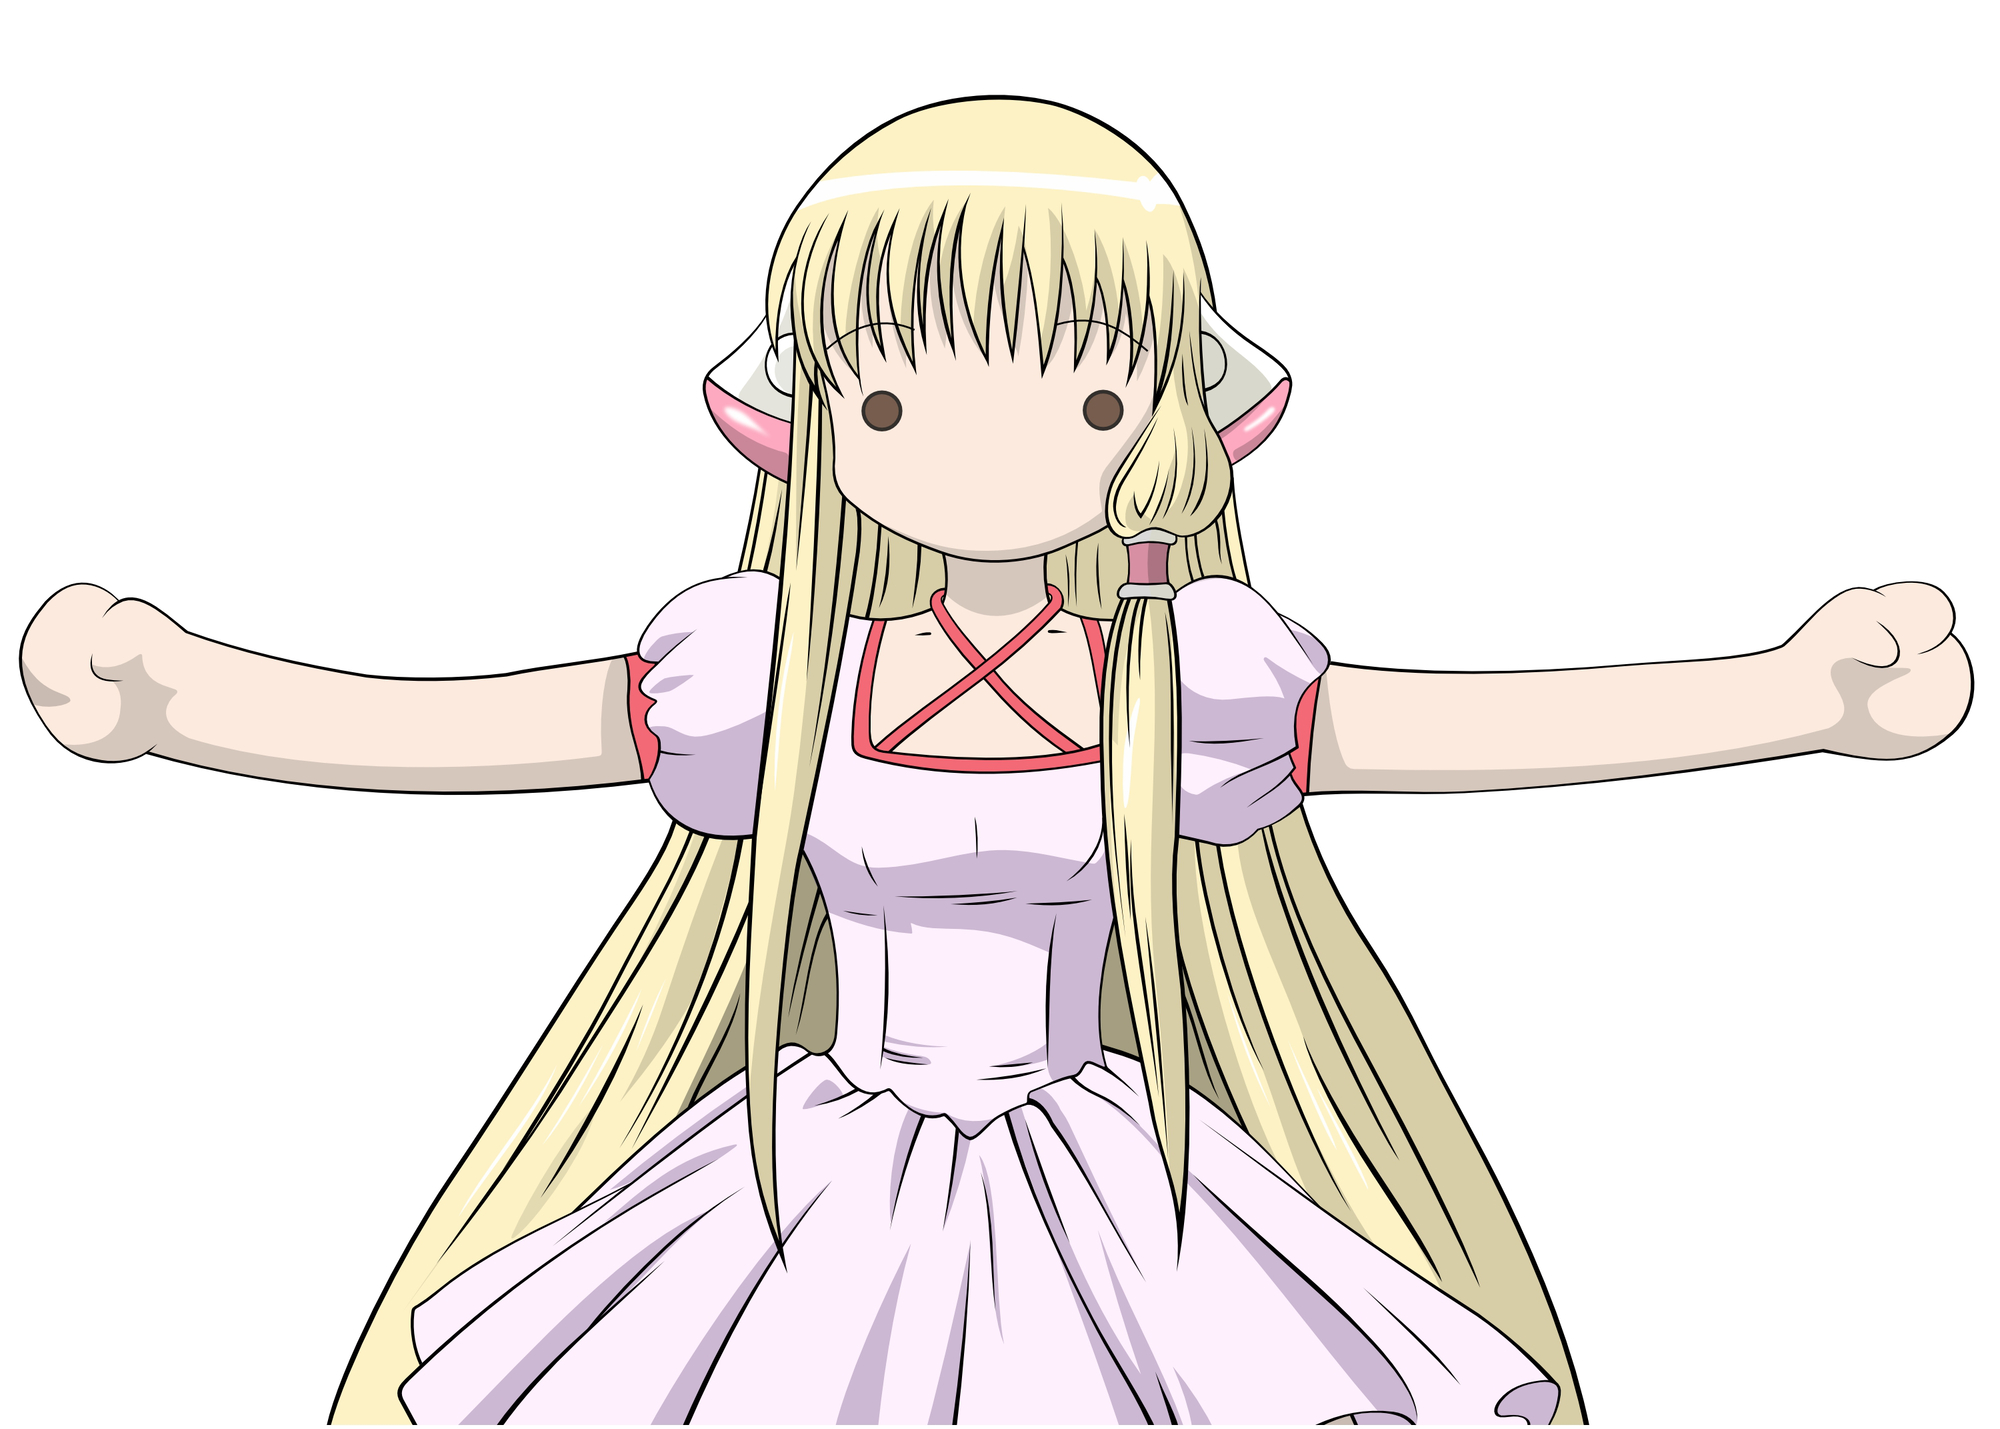 chii chobits dress long_hair